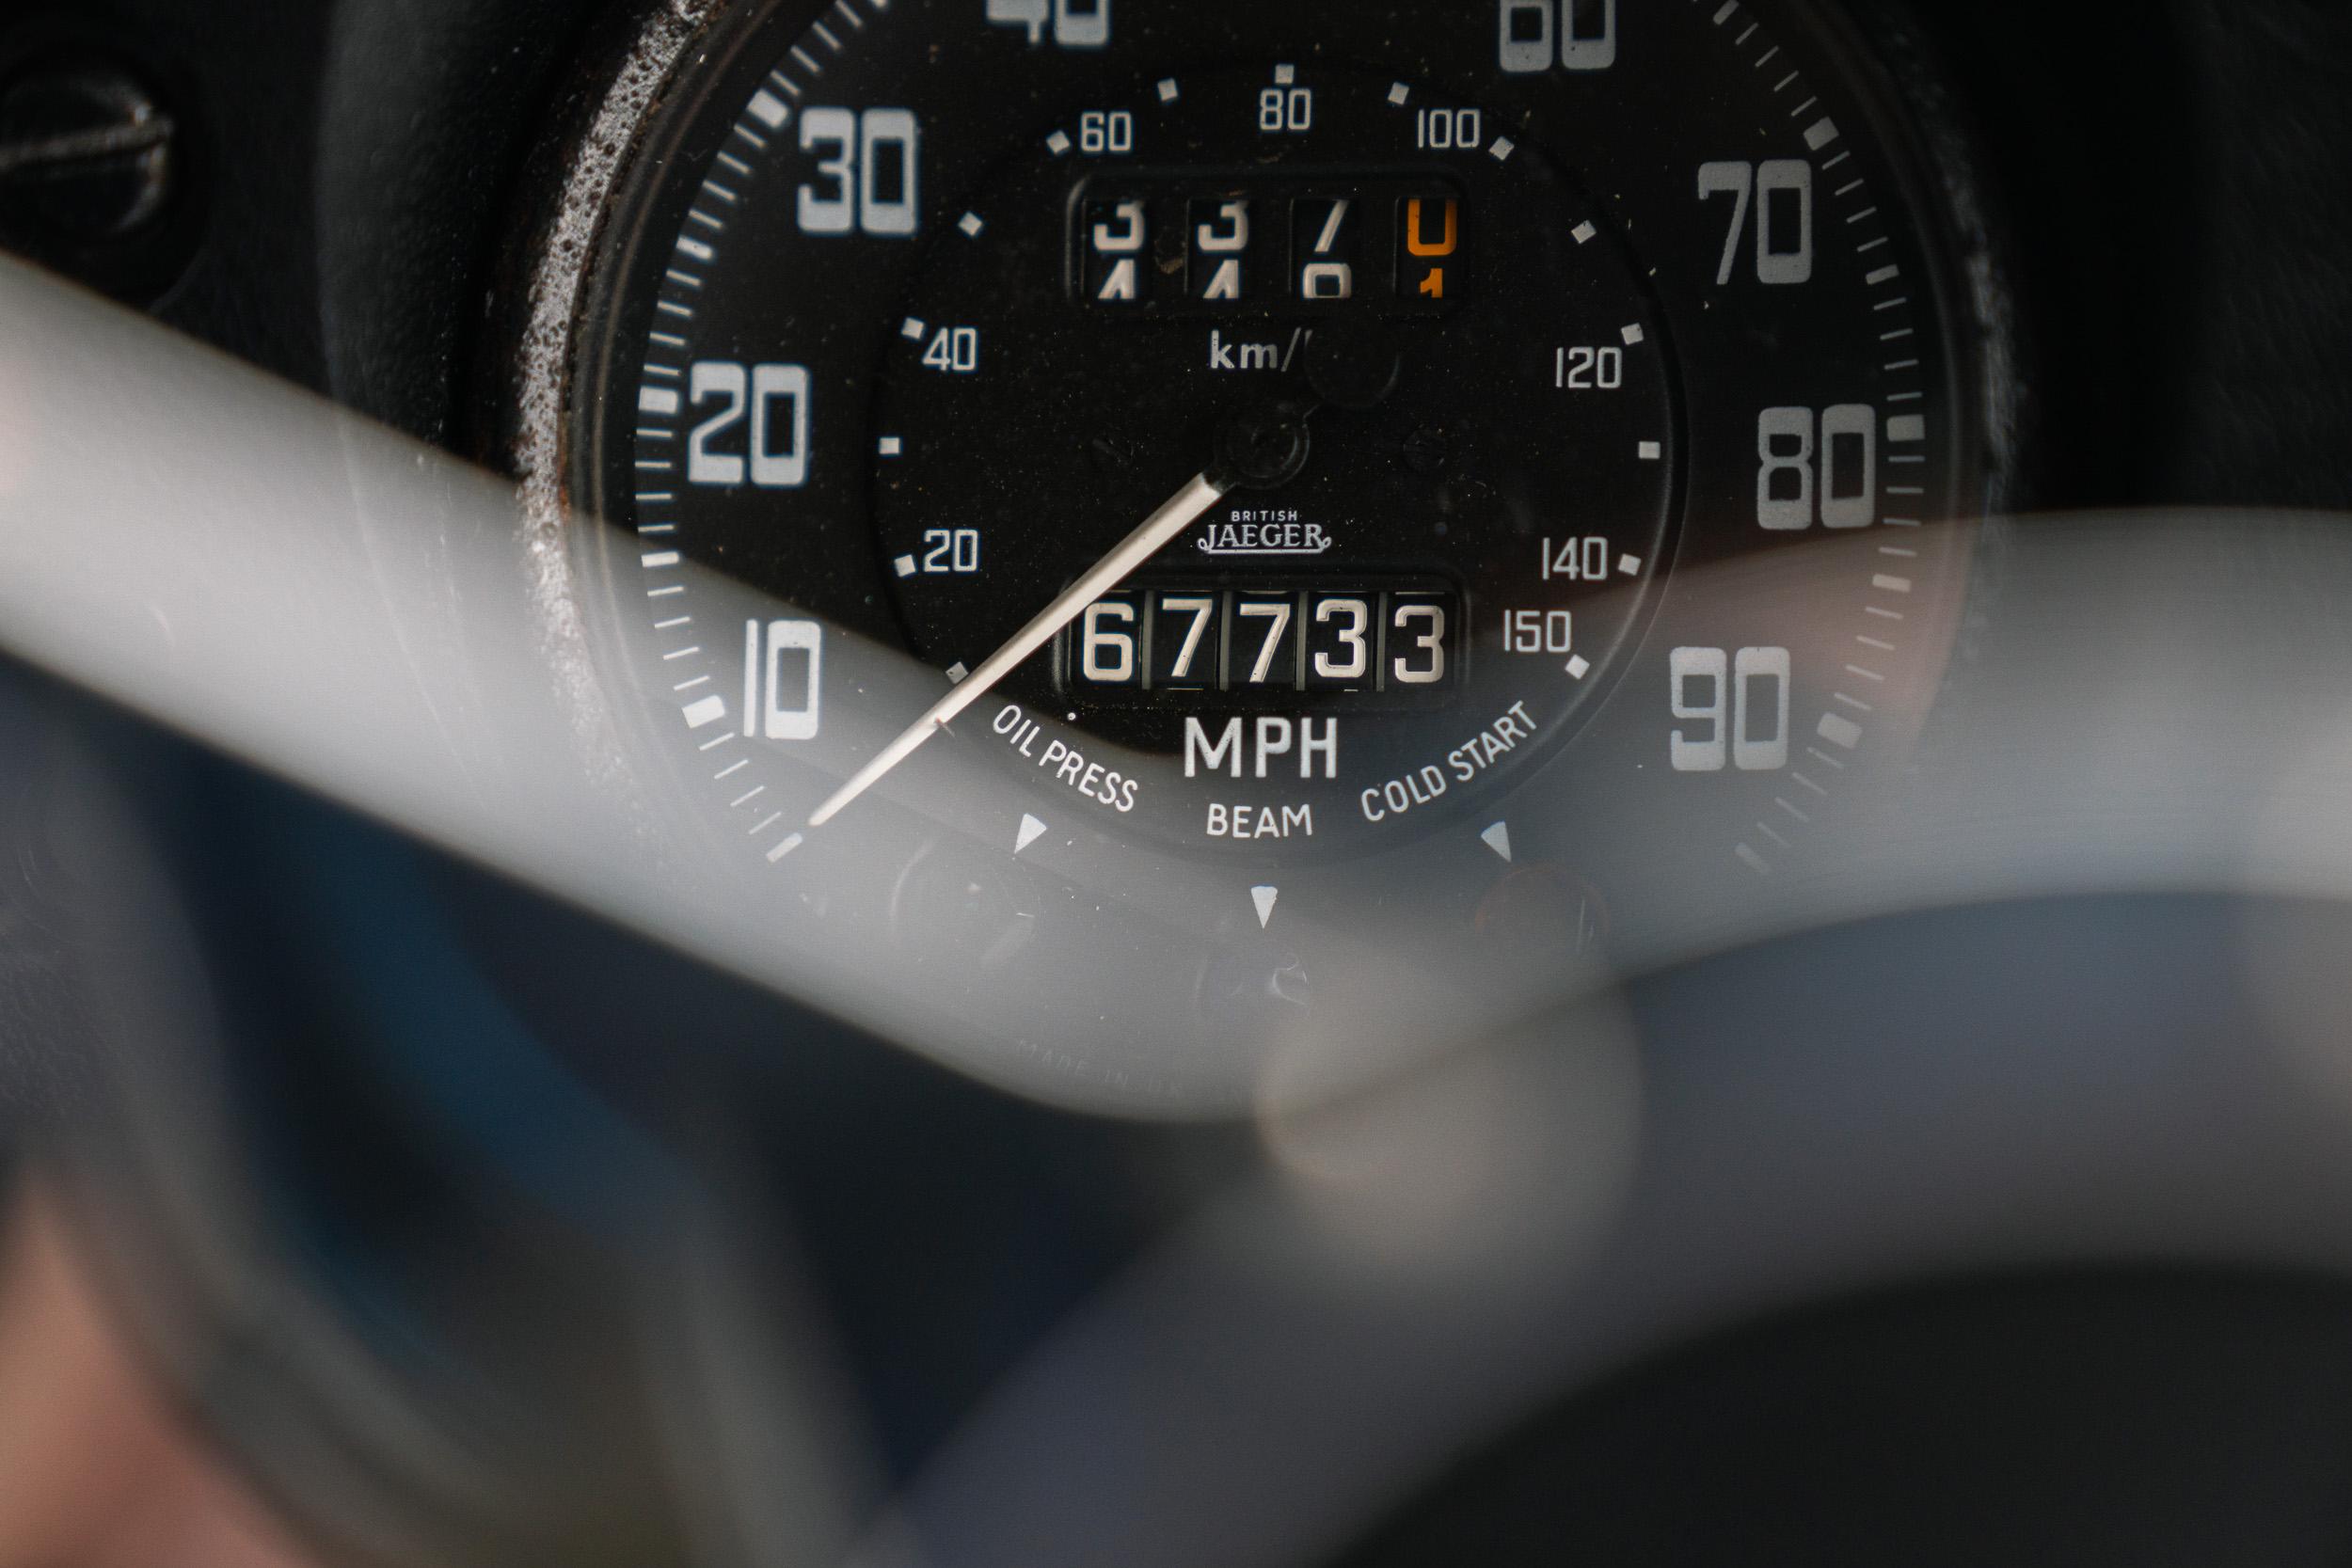 1982 Land Rover speedometer